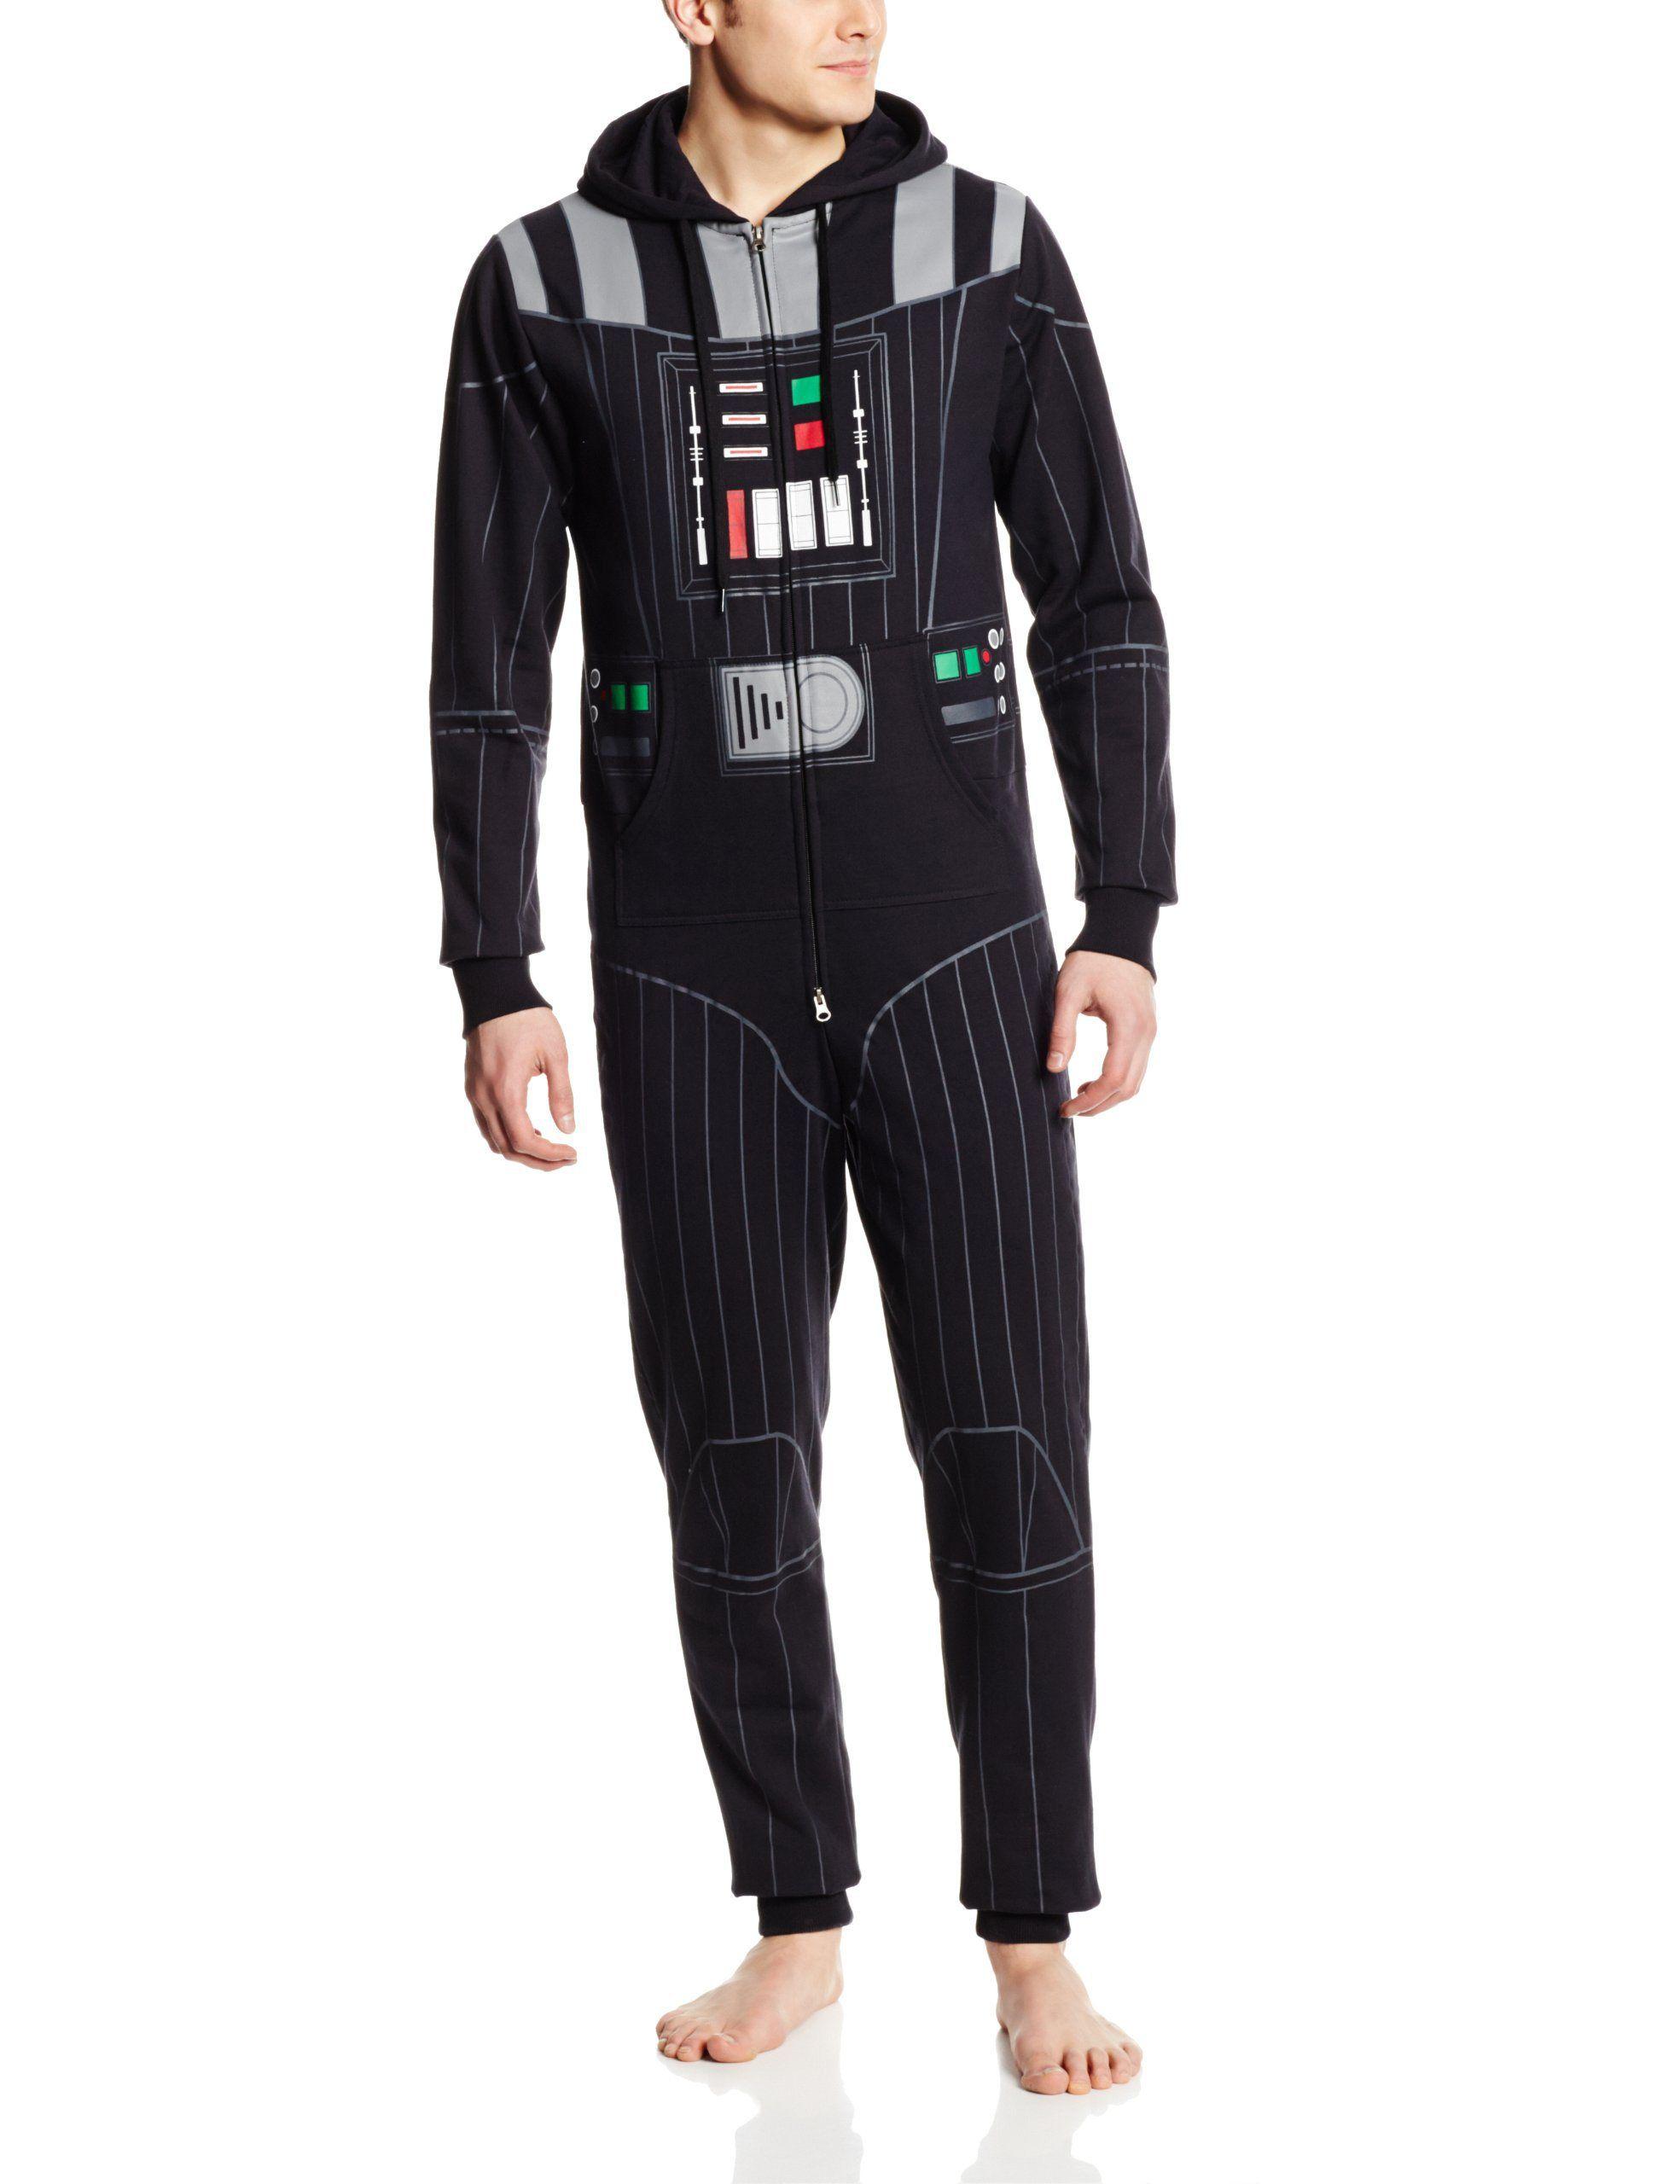 Darth Vader Star Wars Men's Onesie One Piece Pajamas cosplay ...